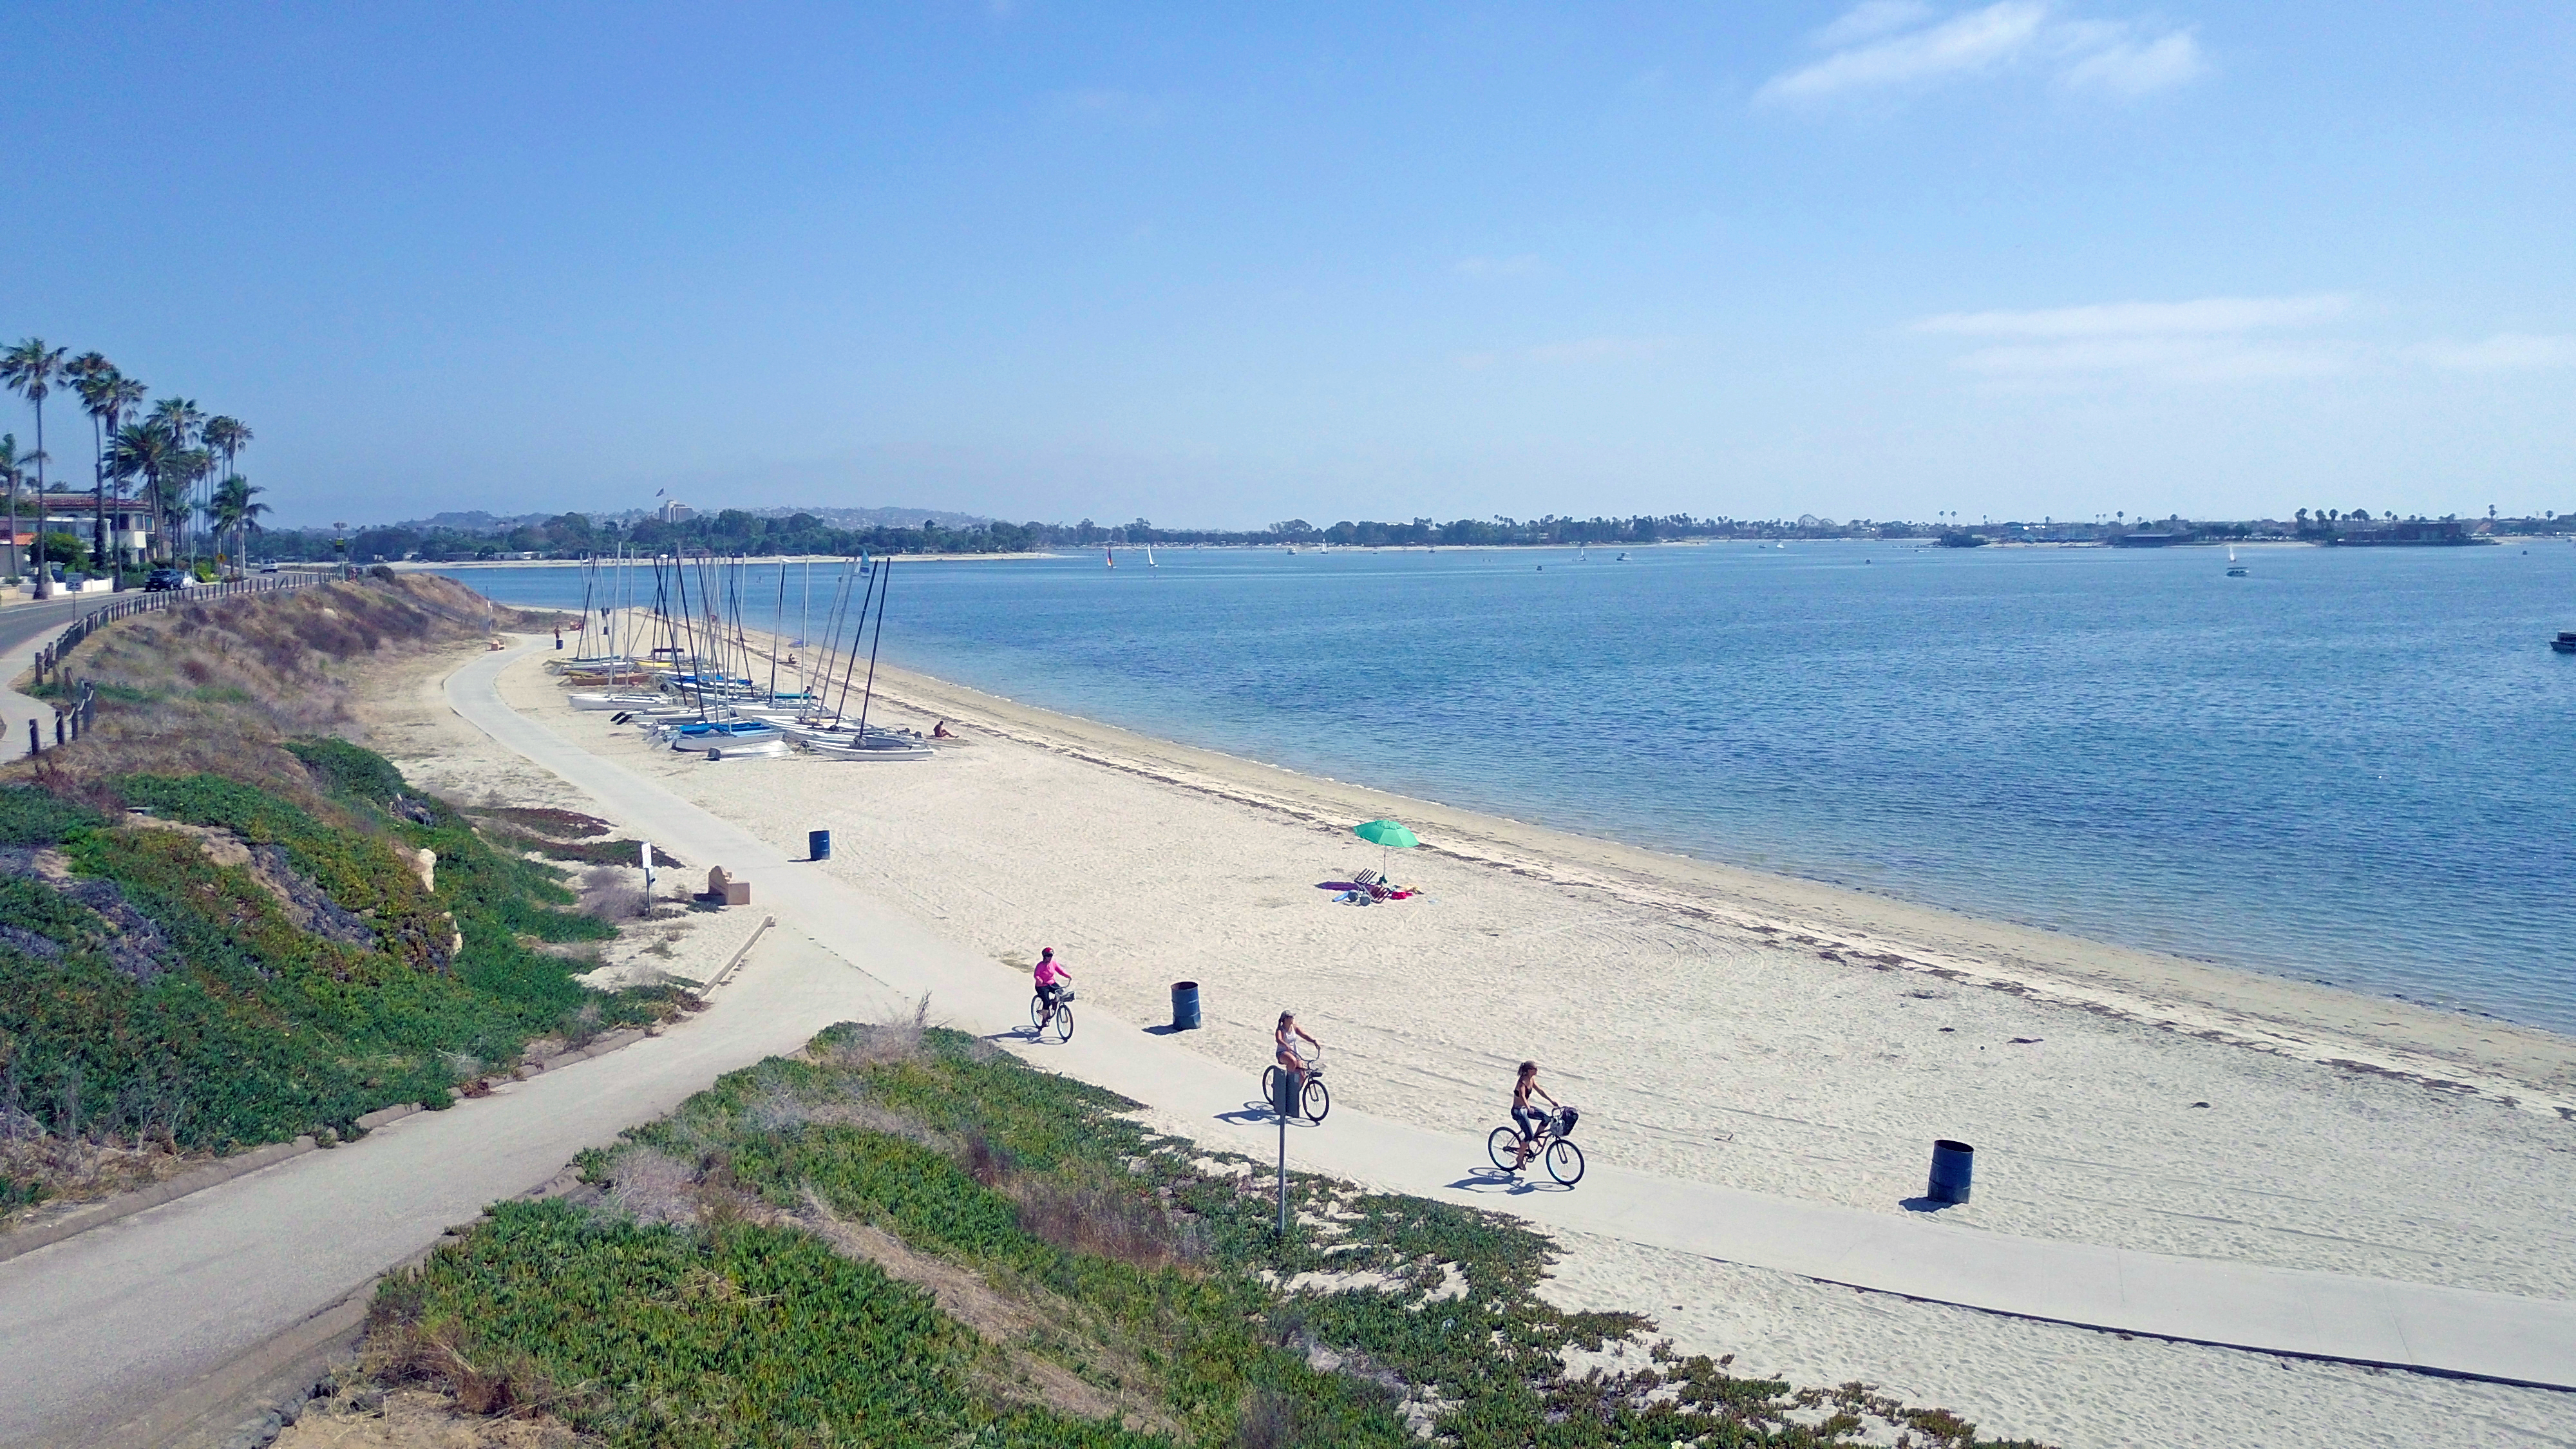 Biking by the Bay